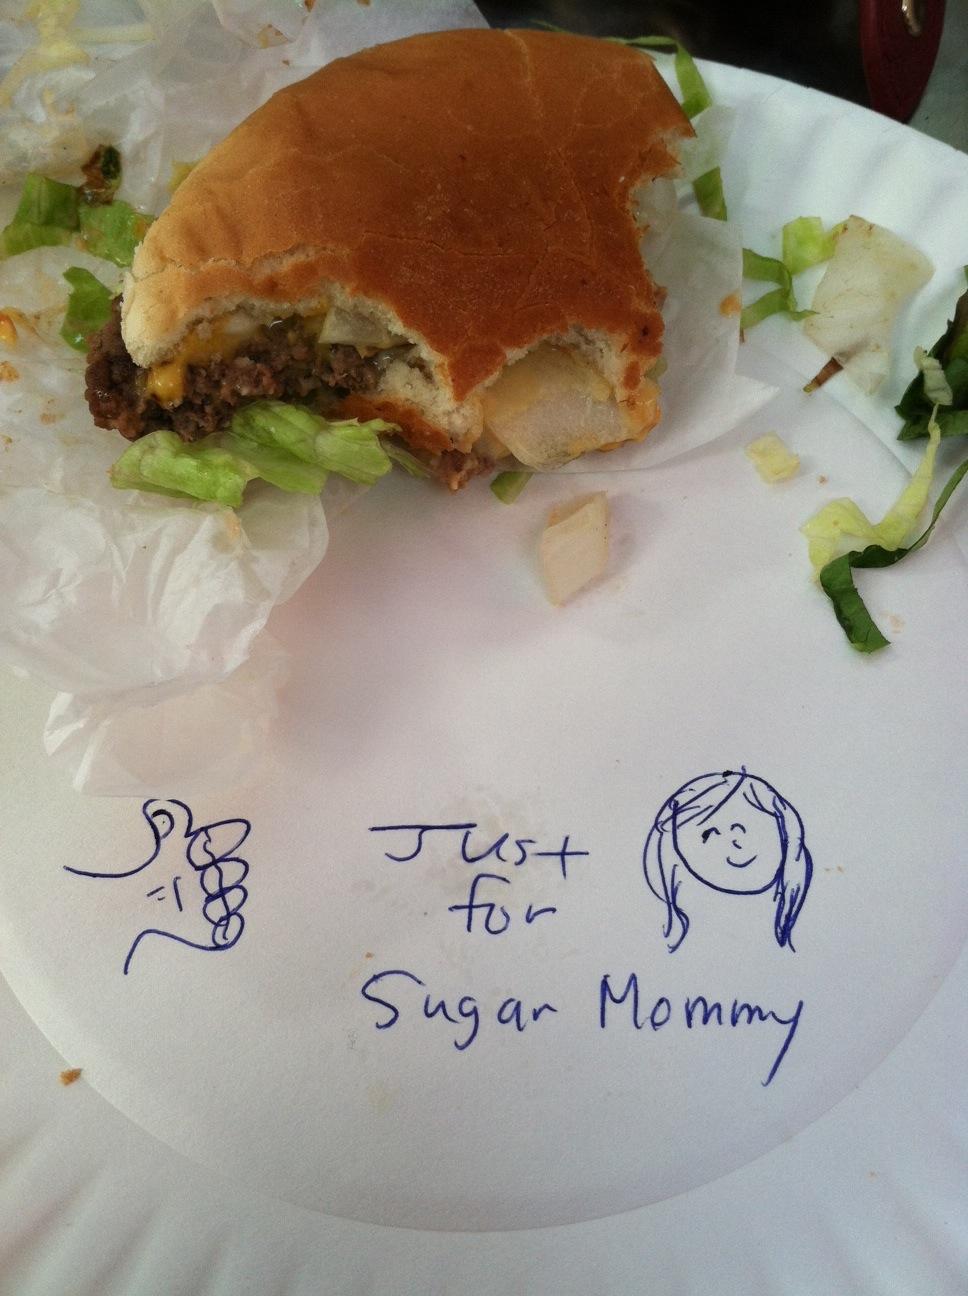 Irv's Burgers Hollywood, Los Angeles sugar momma